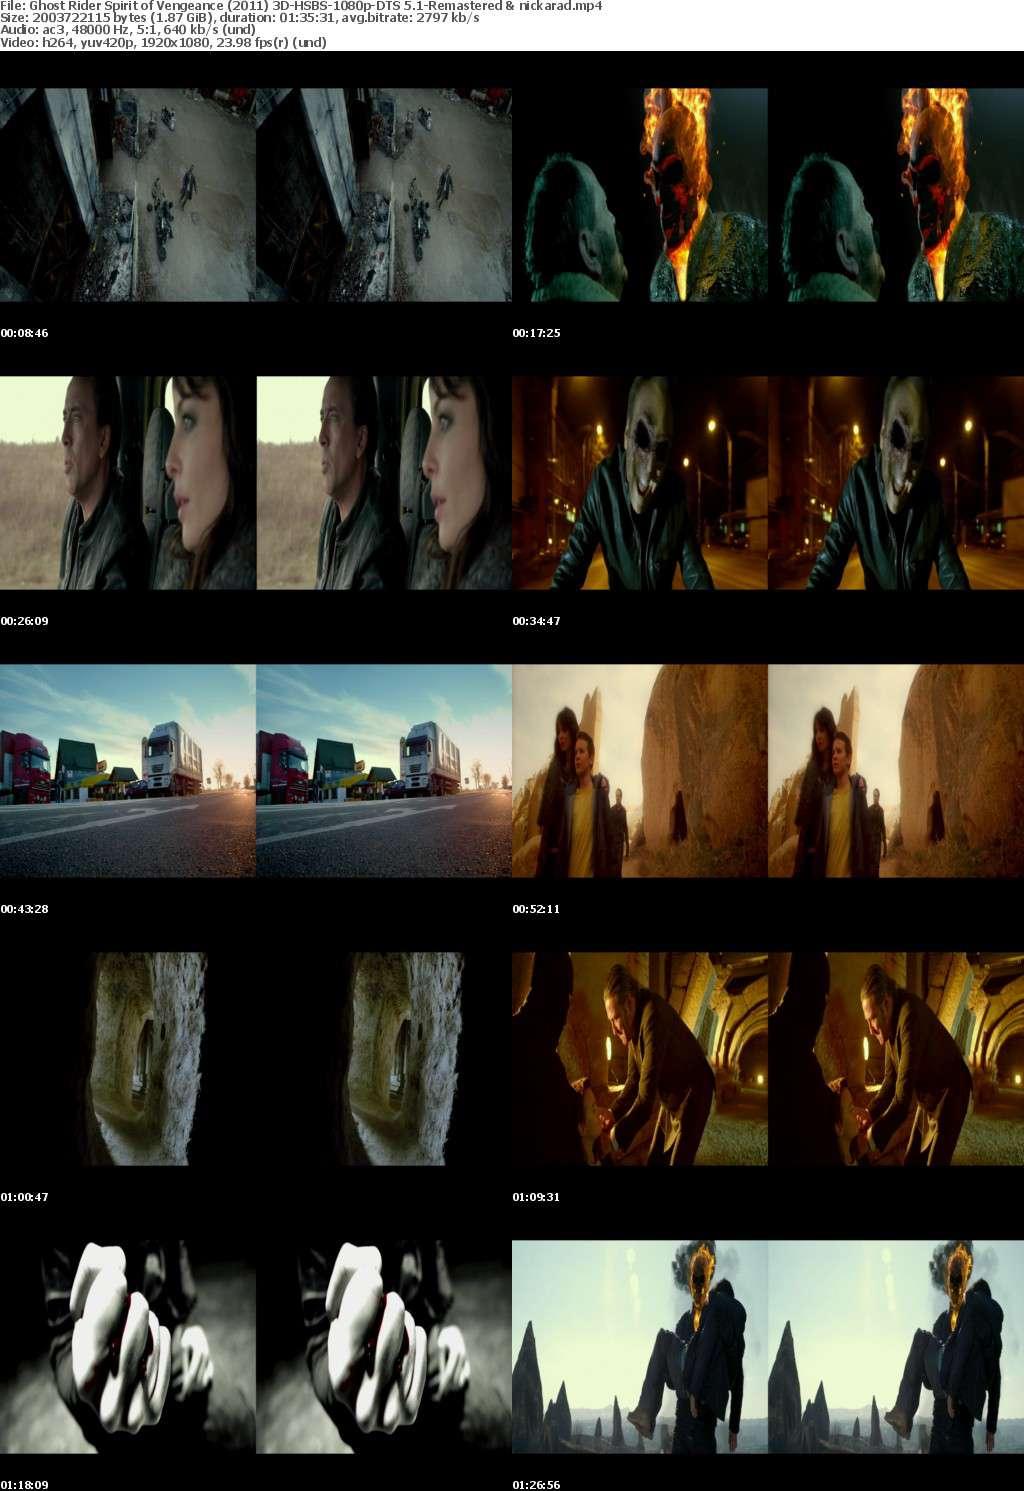 Ghost Rider Spirit of Vengeance (2011) 3D HSBS 1080p BluRay AC3 (DTS 5.1)-Remastered-nickarad